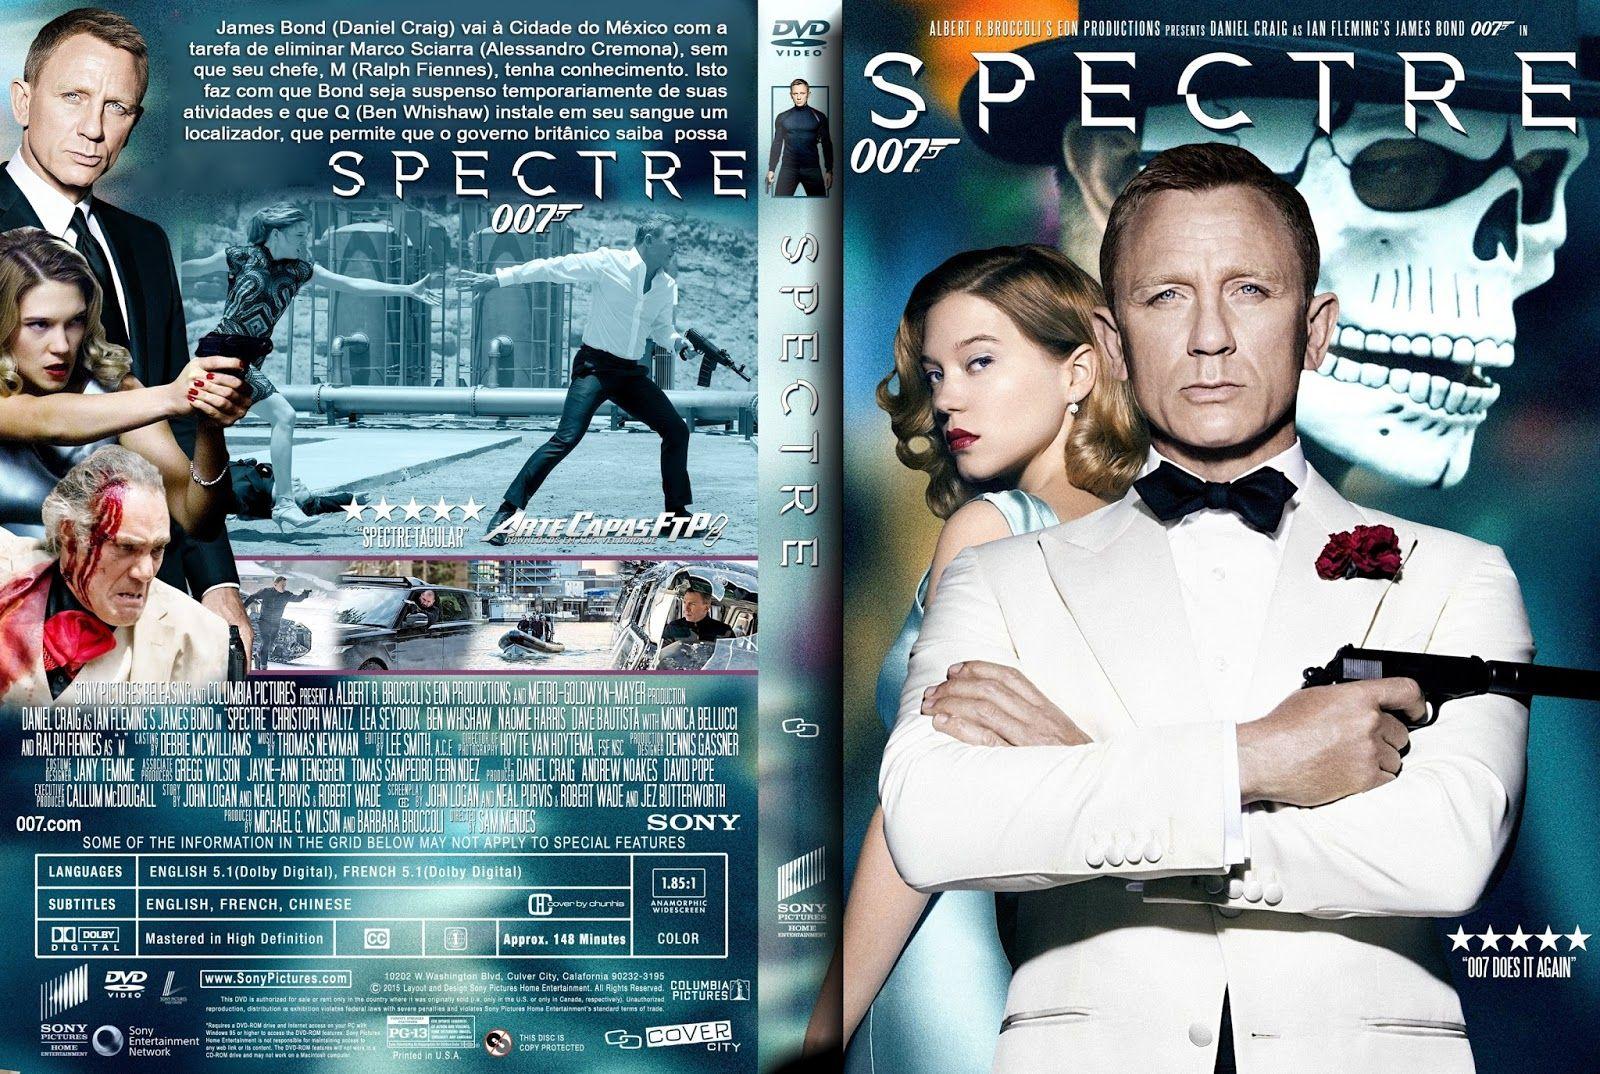 007 Contra Spectre Meus Dvd S Pinterest